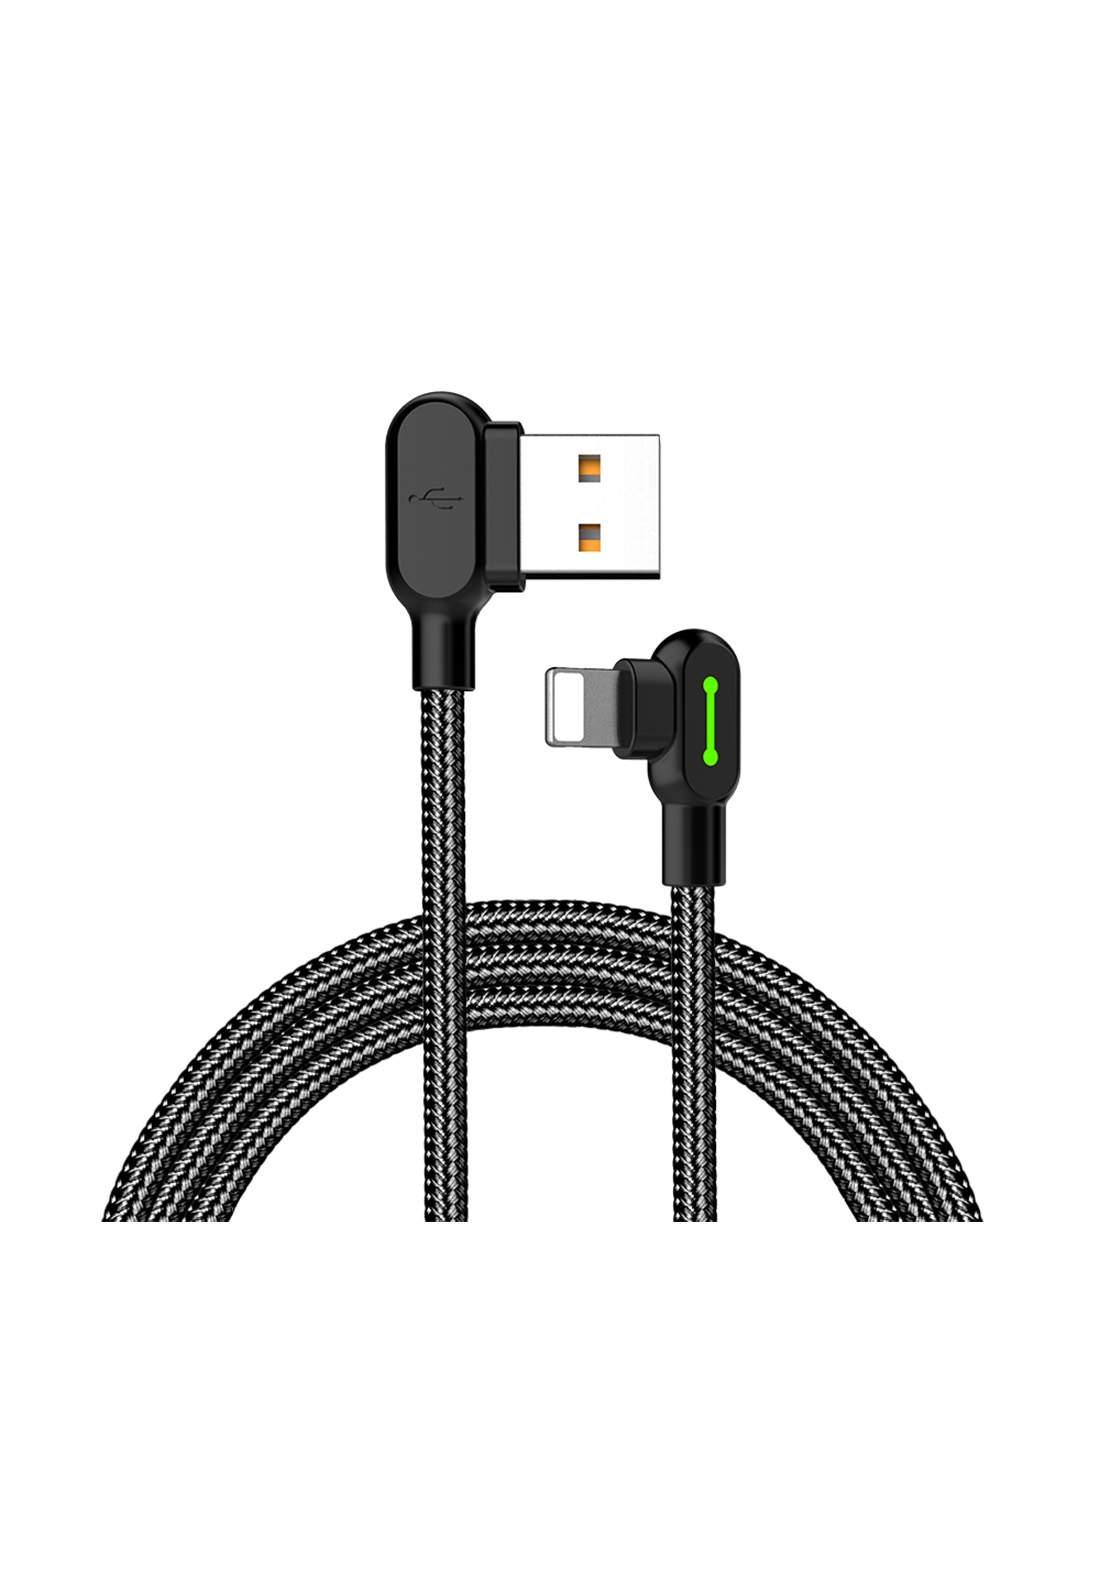 (3438)Mcdodo CA04673 USB to Lightning Cable 1.8 m - Black كابل